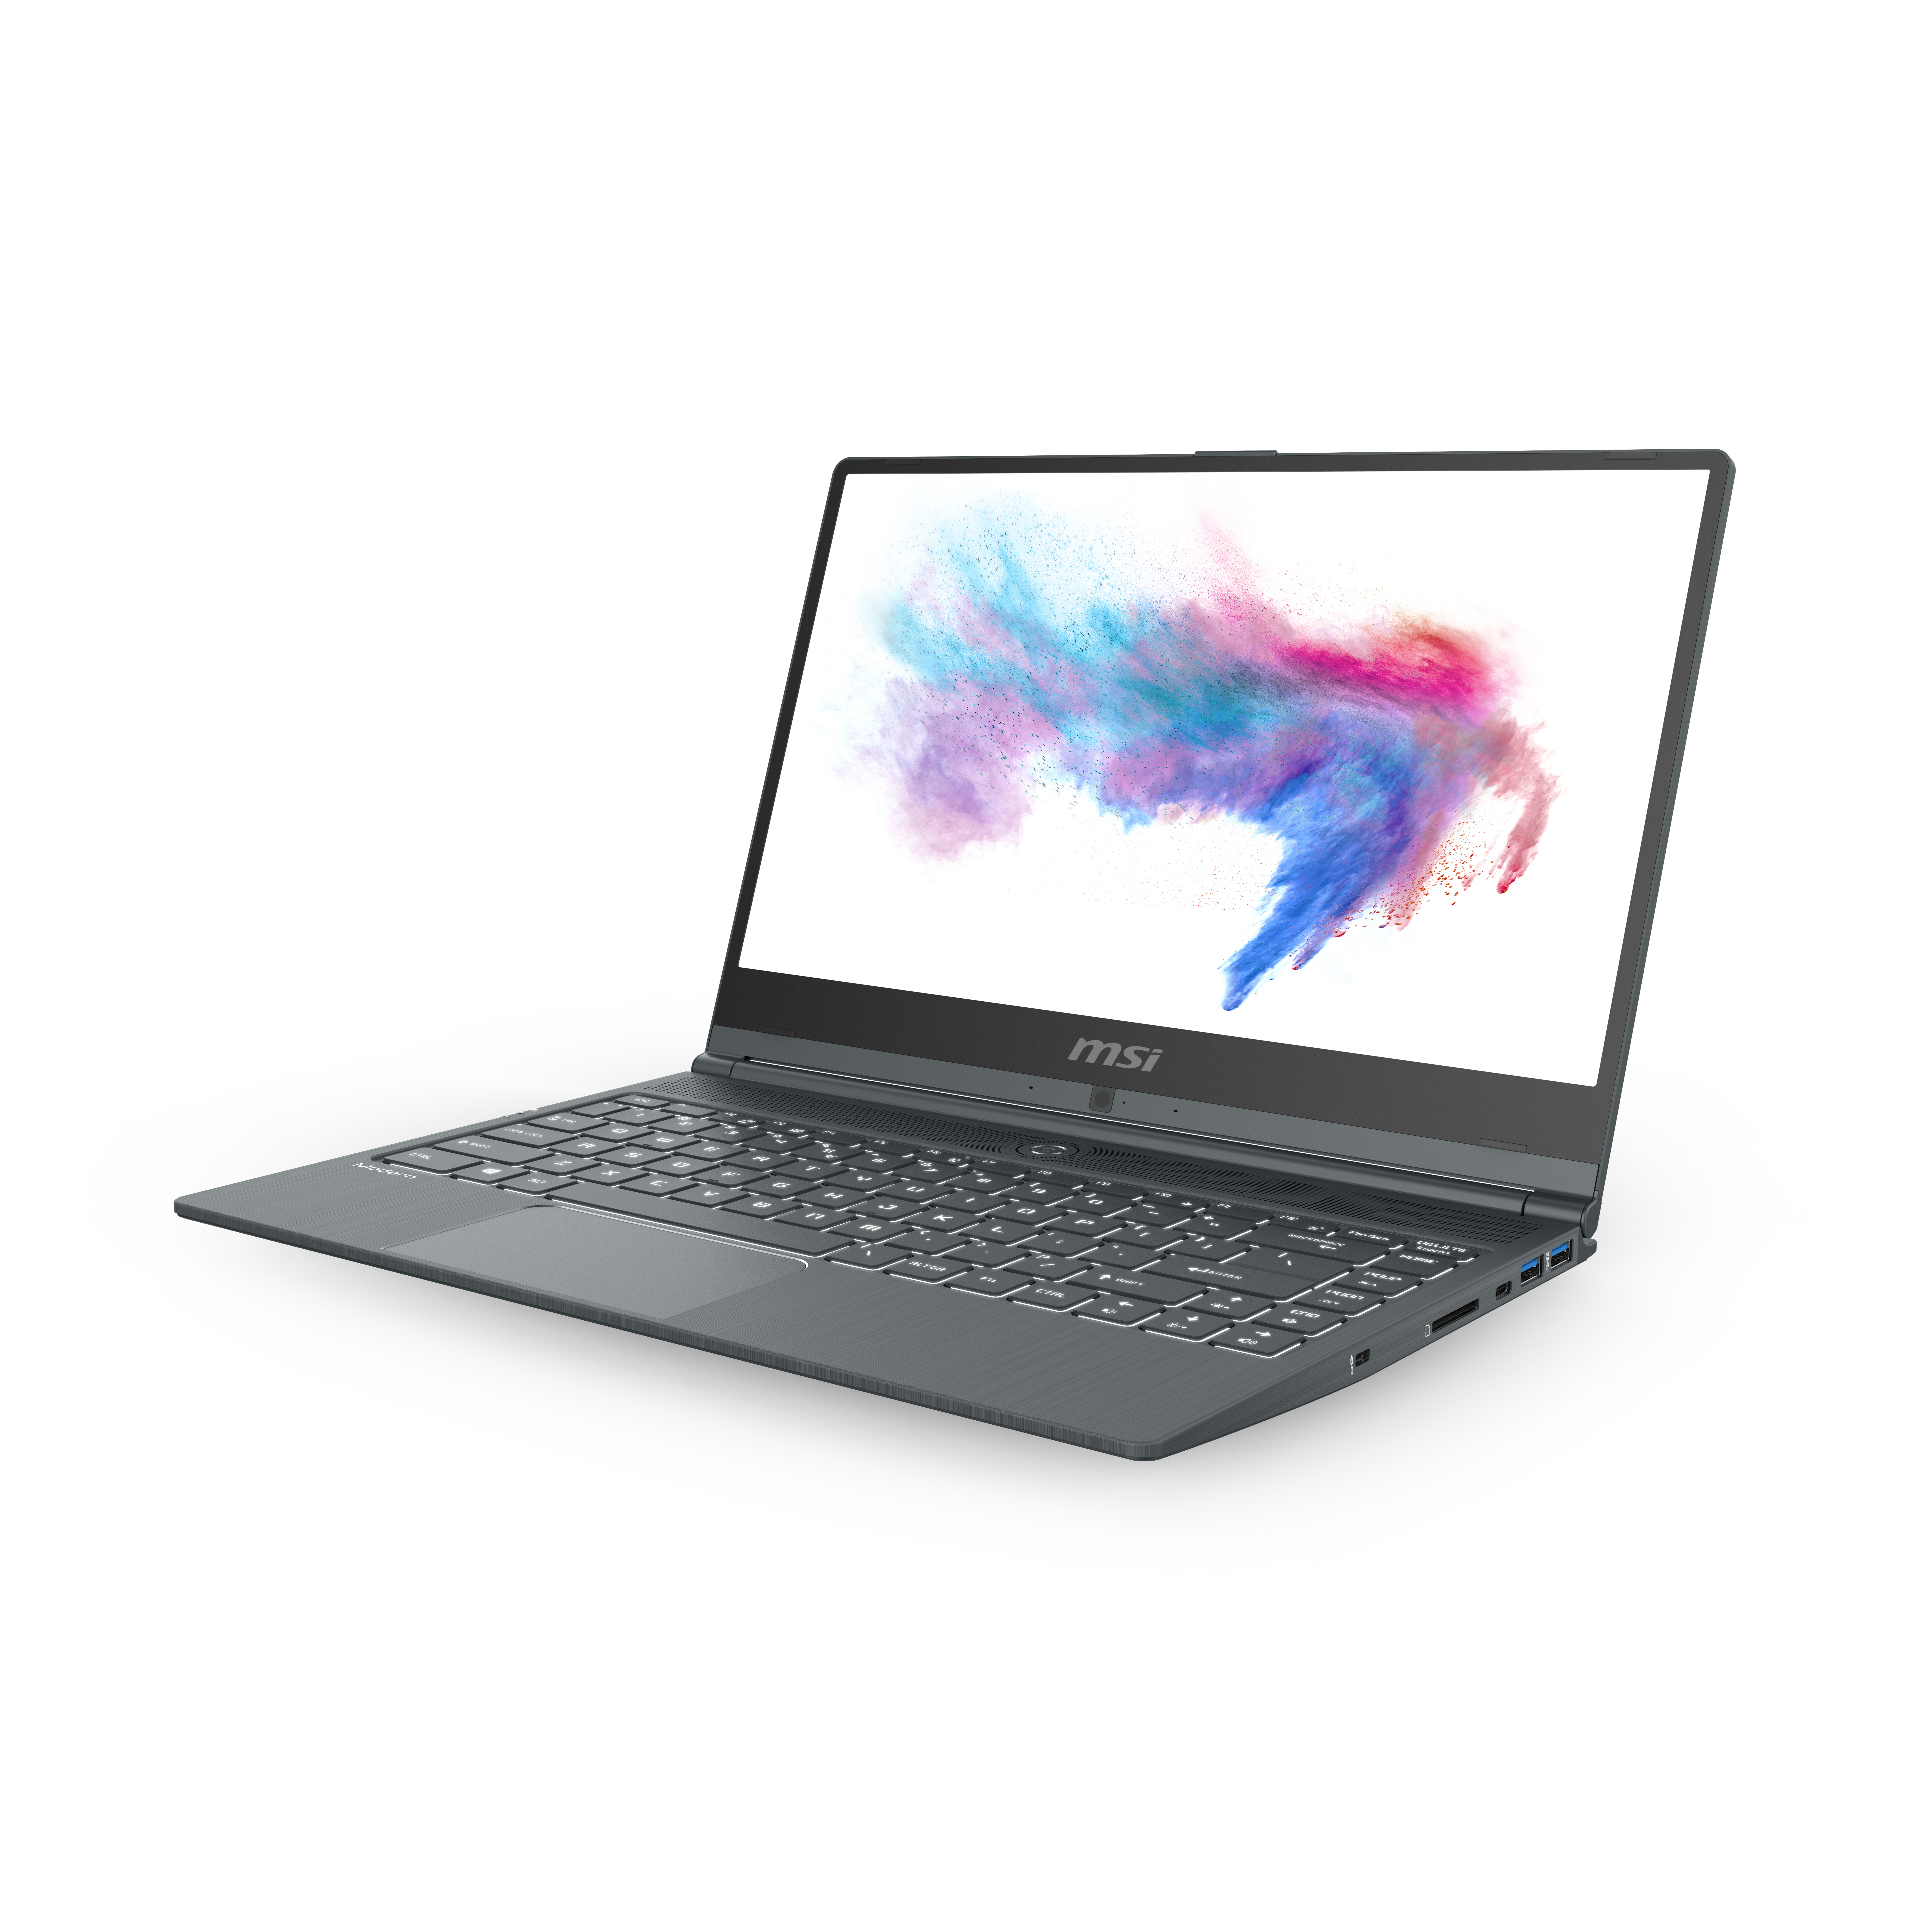 MSI Modern 14 A10M-818 - Intel® Core™ i7 Prozessoren der 10. Generation - 1,8 GHz - 35,6 cm (14 Zoll) - 1920 x 1080 Pixel - 8 GB - 512 GB